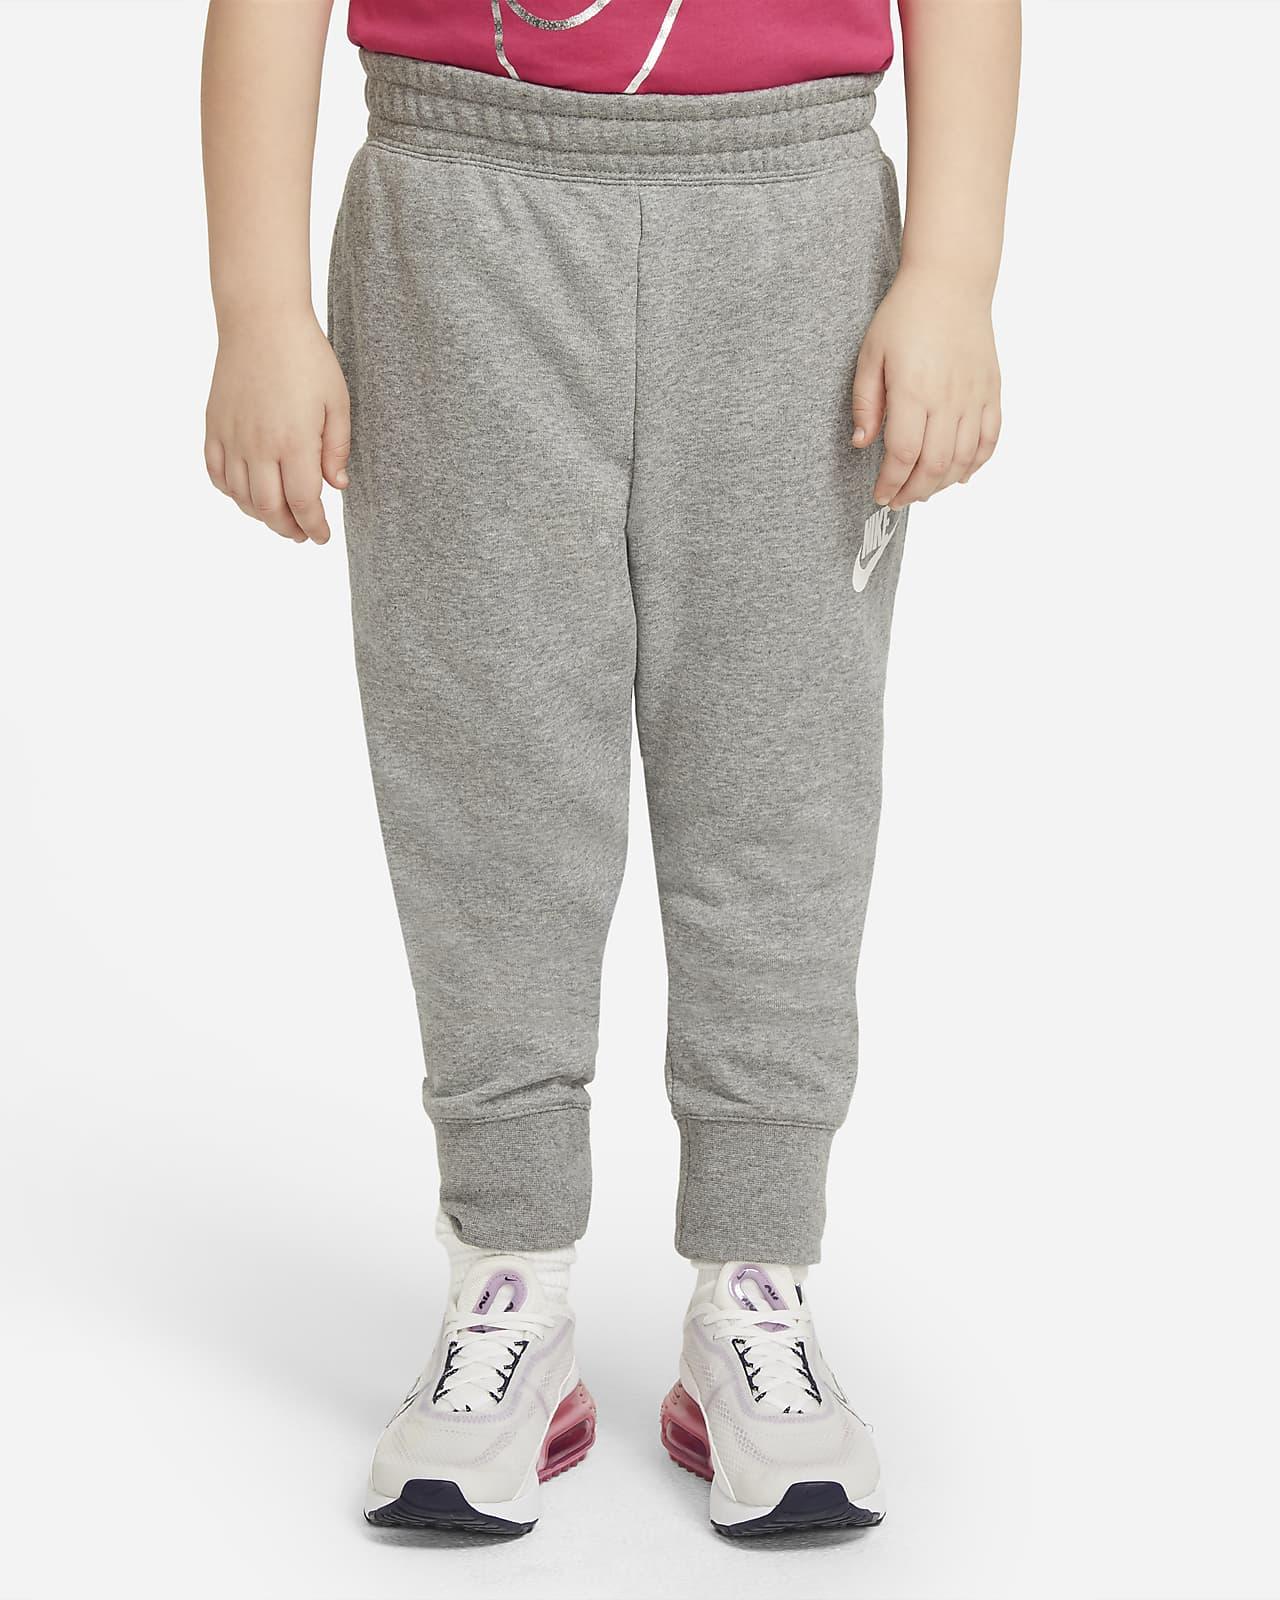 Pantaloni aderenti in French Terry Nike Sportswear Club (Taglia grande) - Ragazza